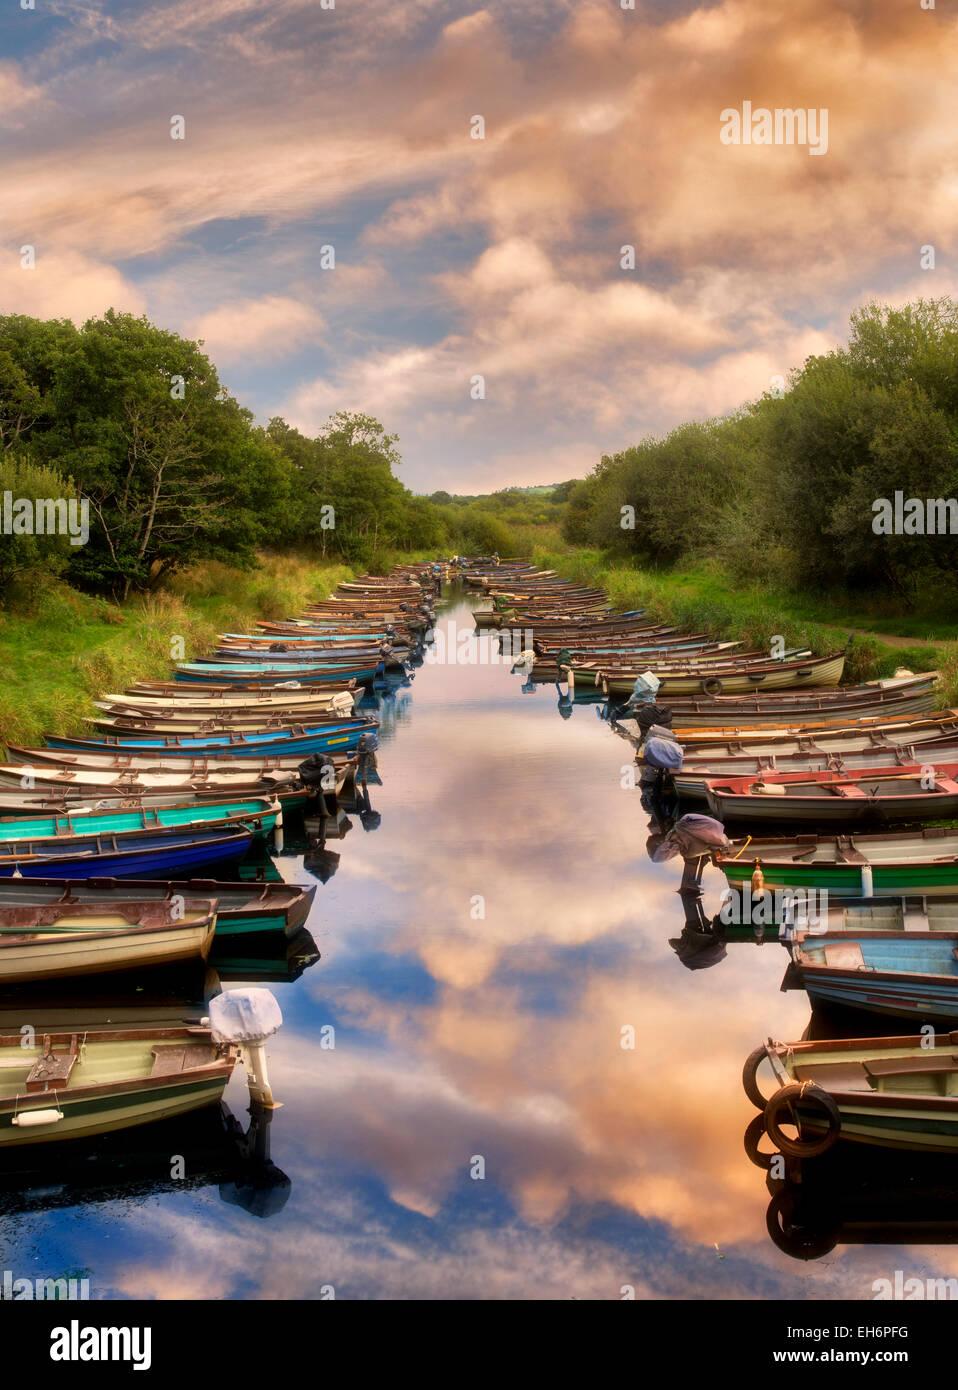 Fishing boats in small inlet. Killarney National Park, Ireland. - Stock Image